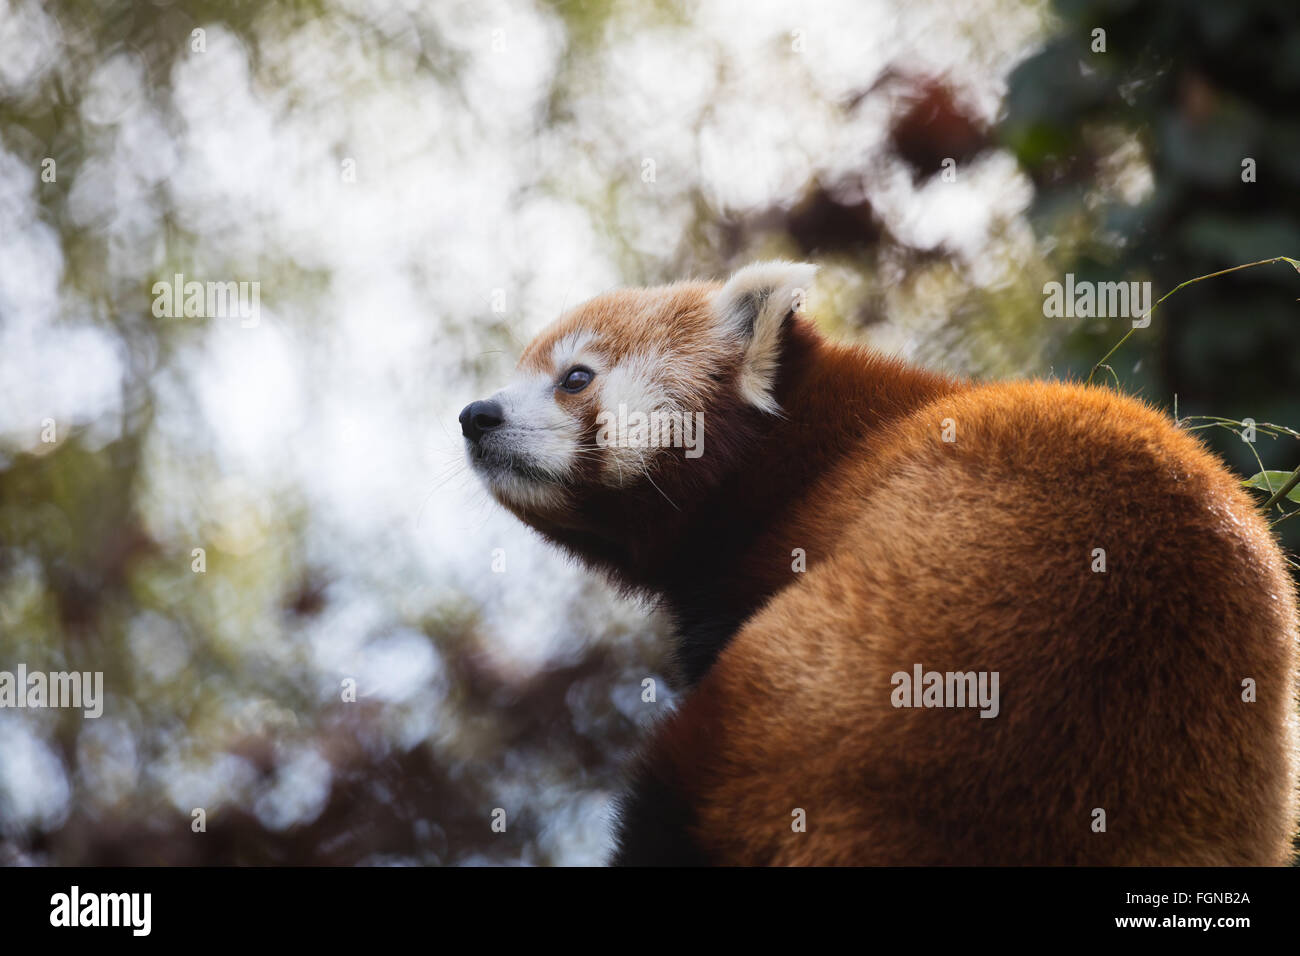 Cute Red Panda (Ailurus fulgens) looking at something - Stock Image